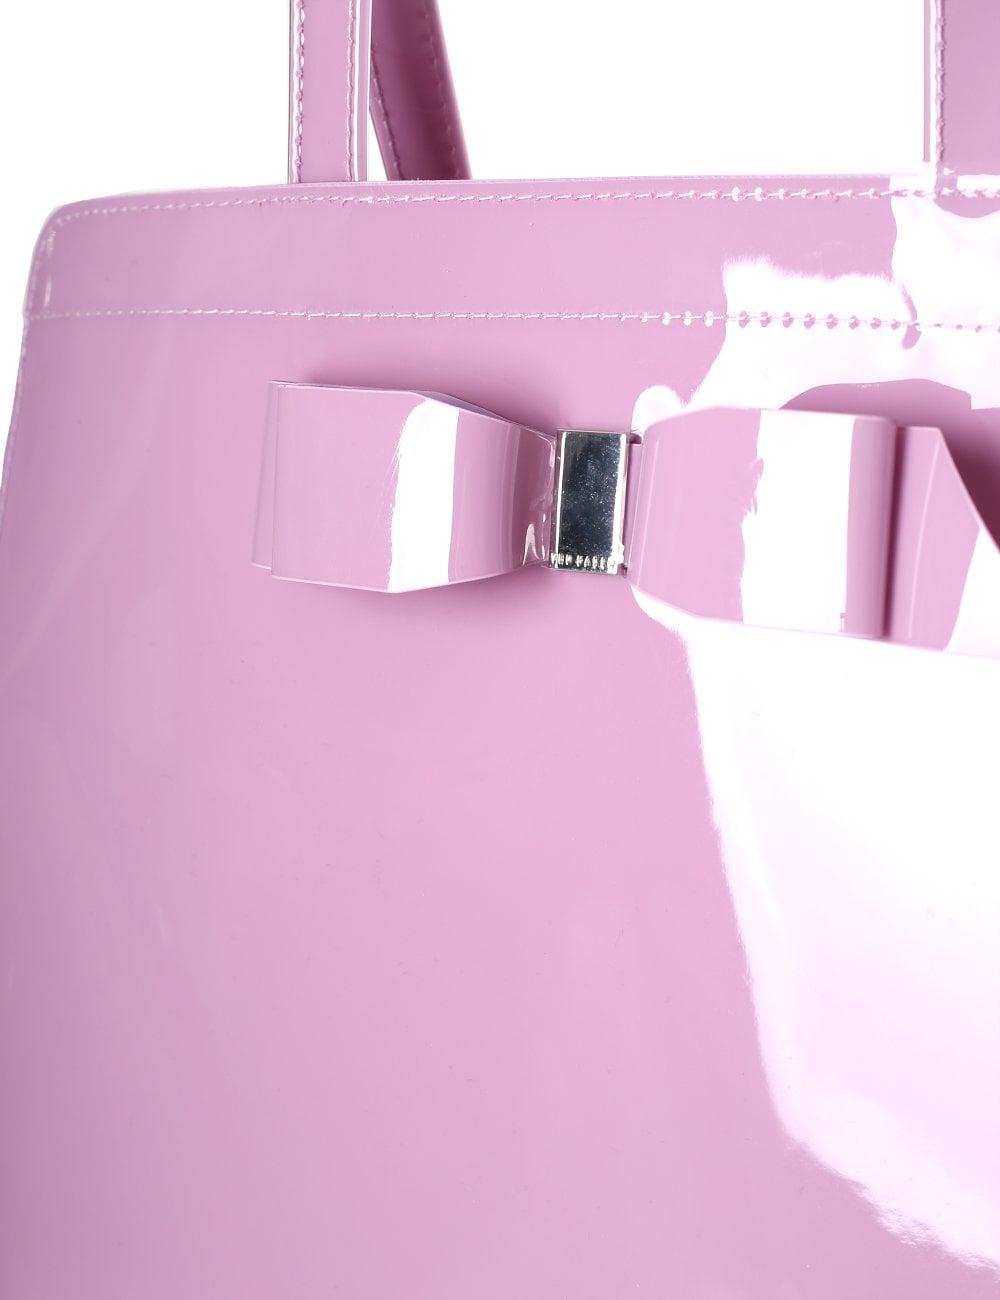 bd3298de019 Ted Baker Women s Almacon Bow Detail Large Icon Bag